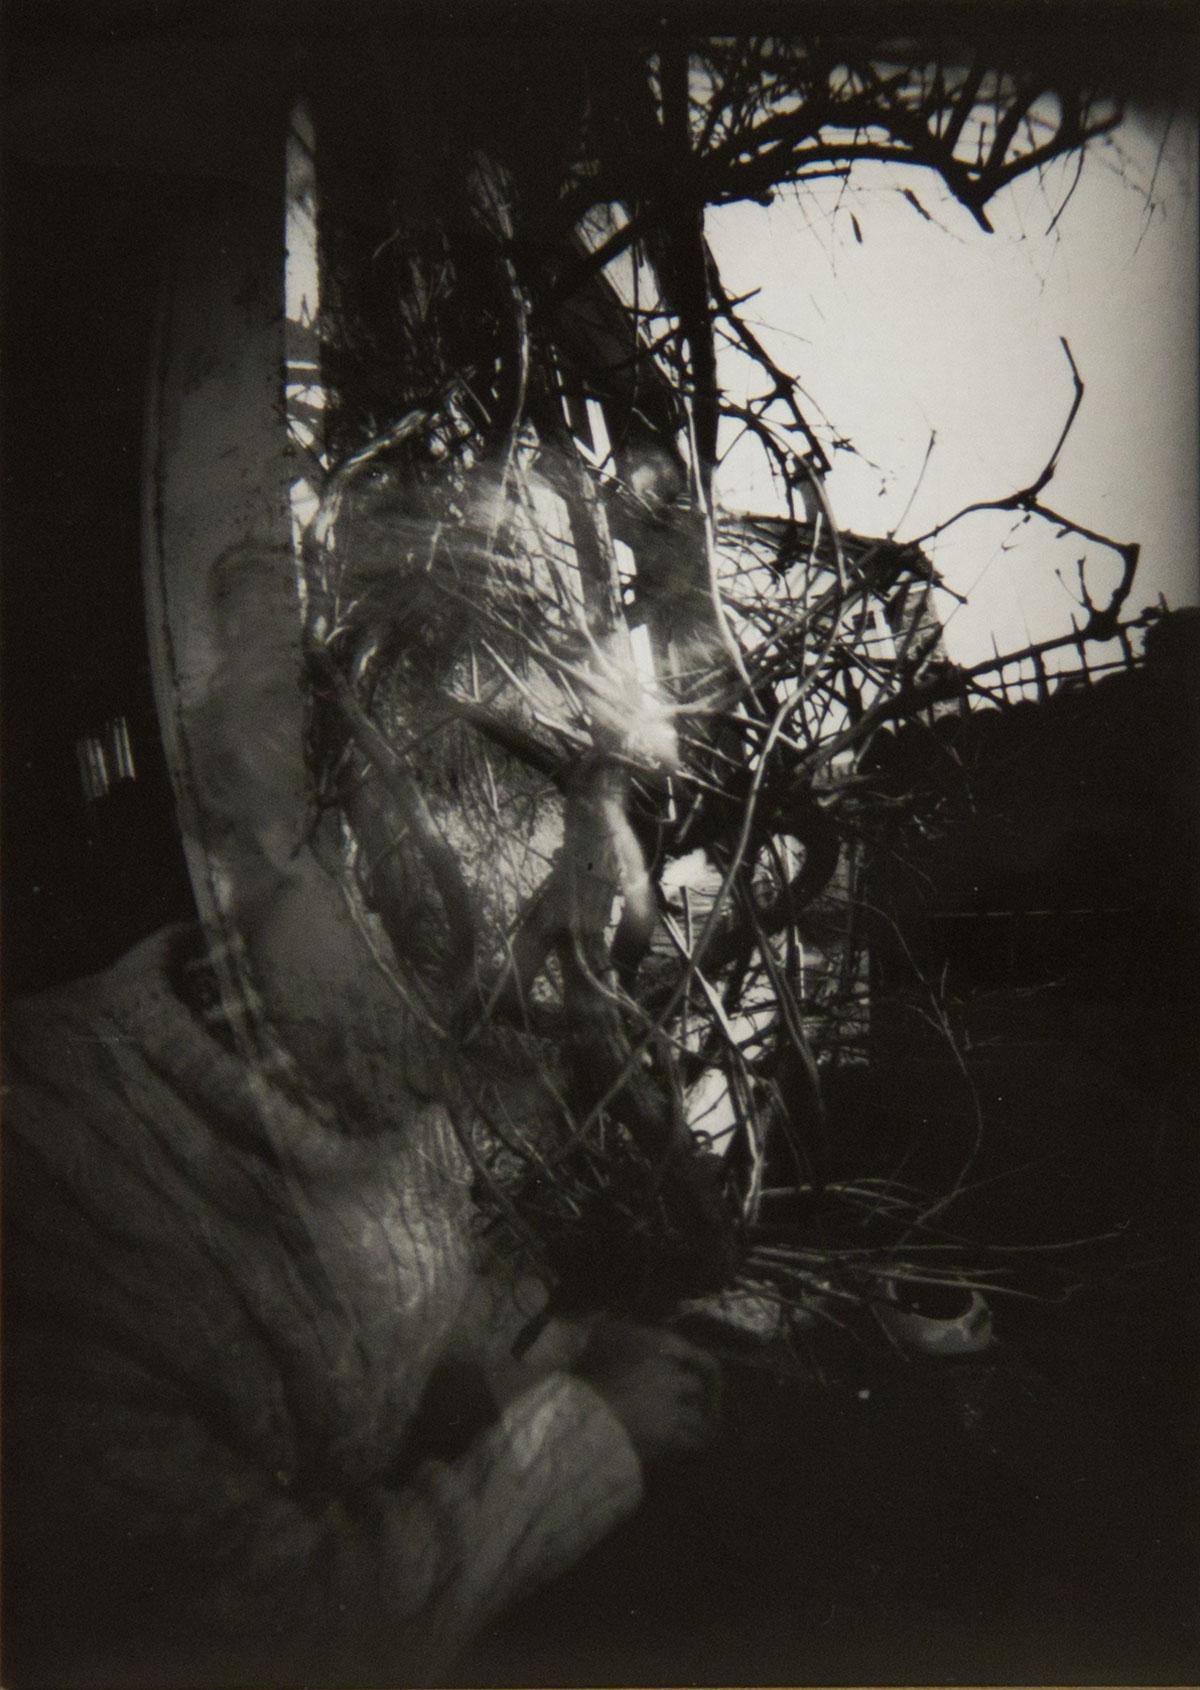 Philippe Briard - Autoportrait, 2007, stenopé, 18 x 12,5 cm